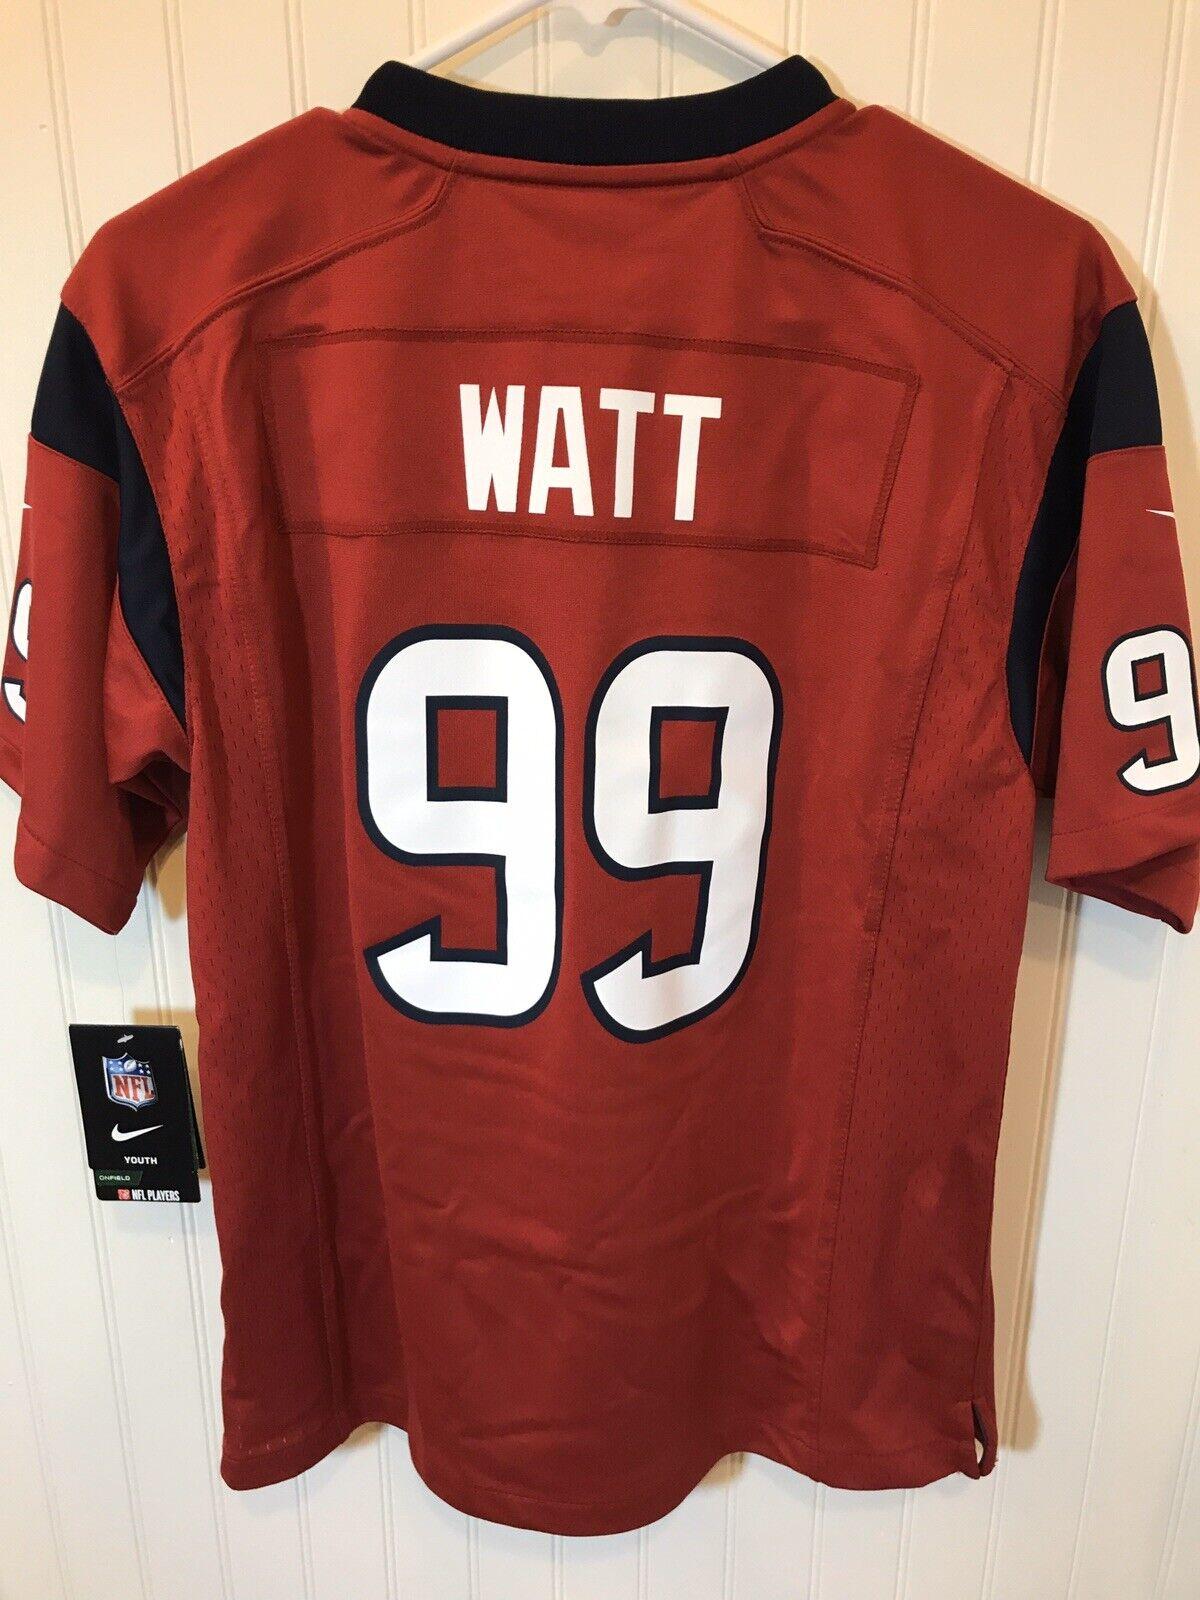 j.j. watt nfl jersey